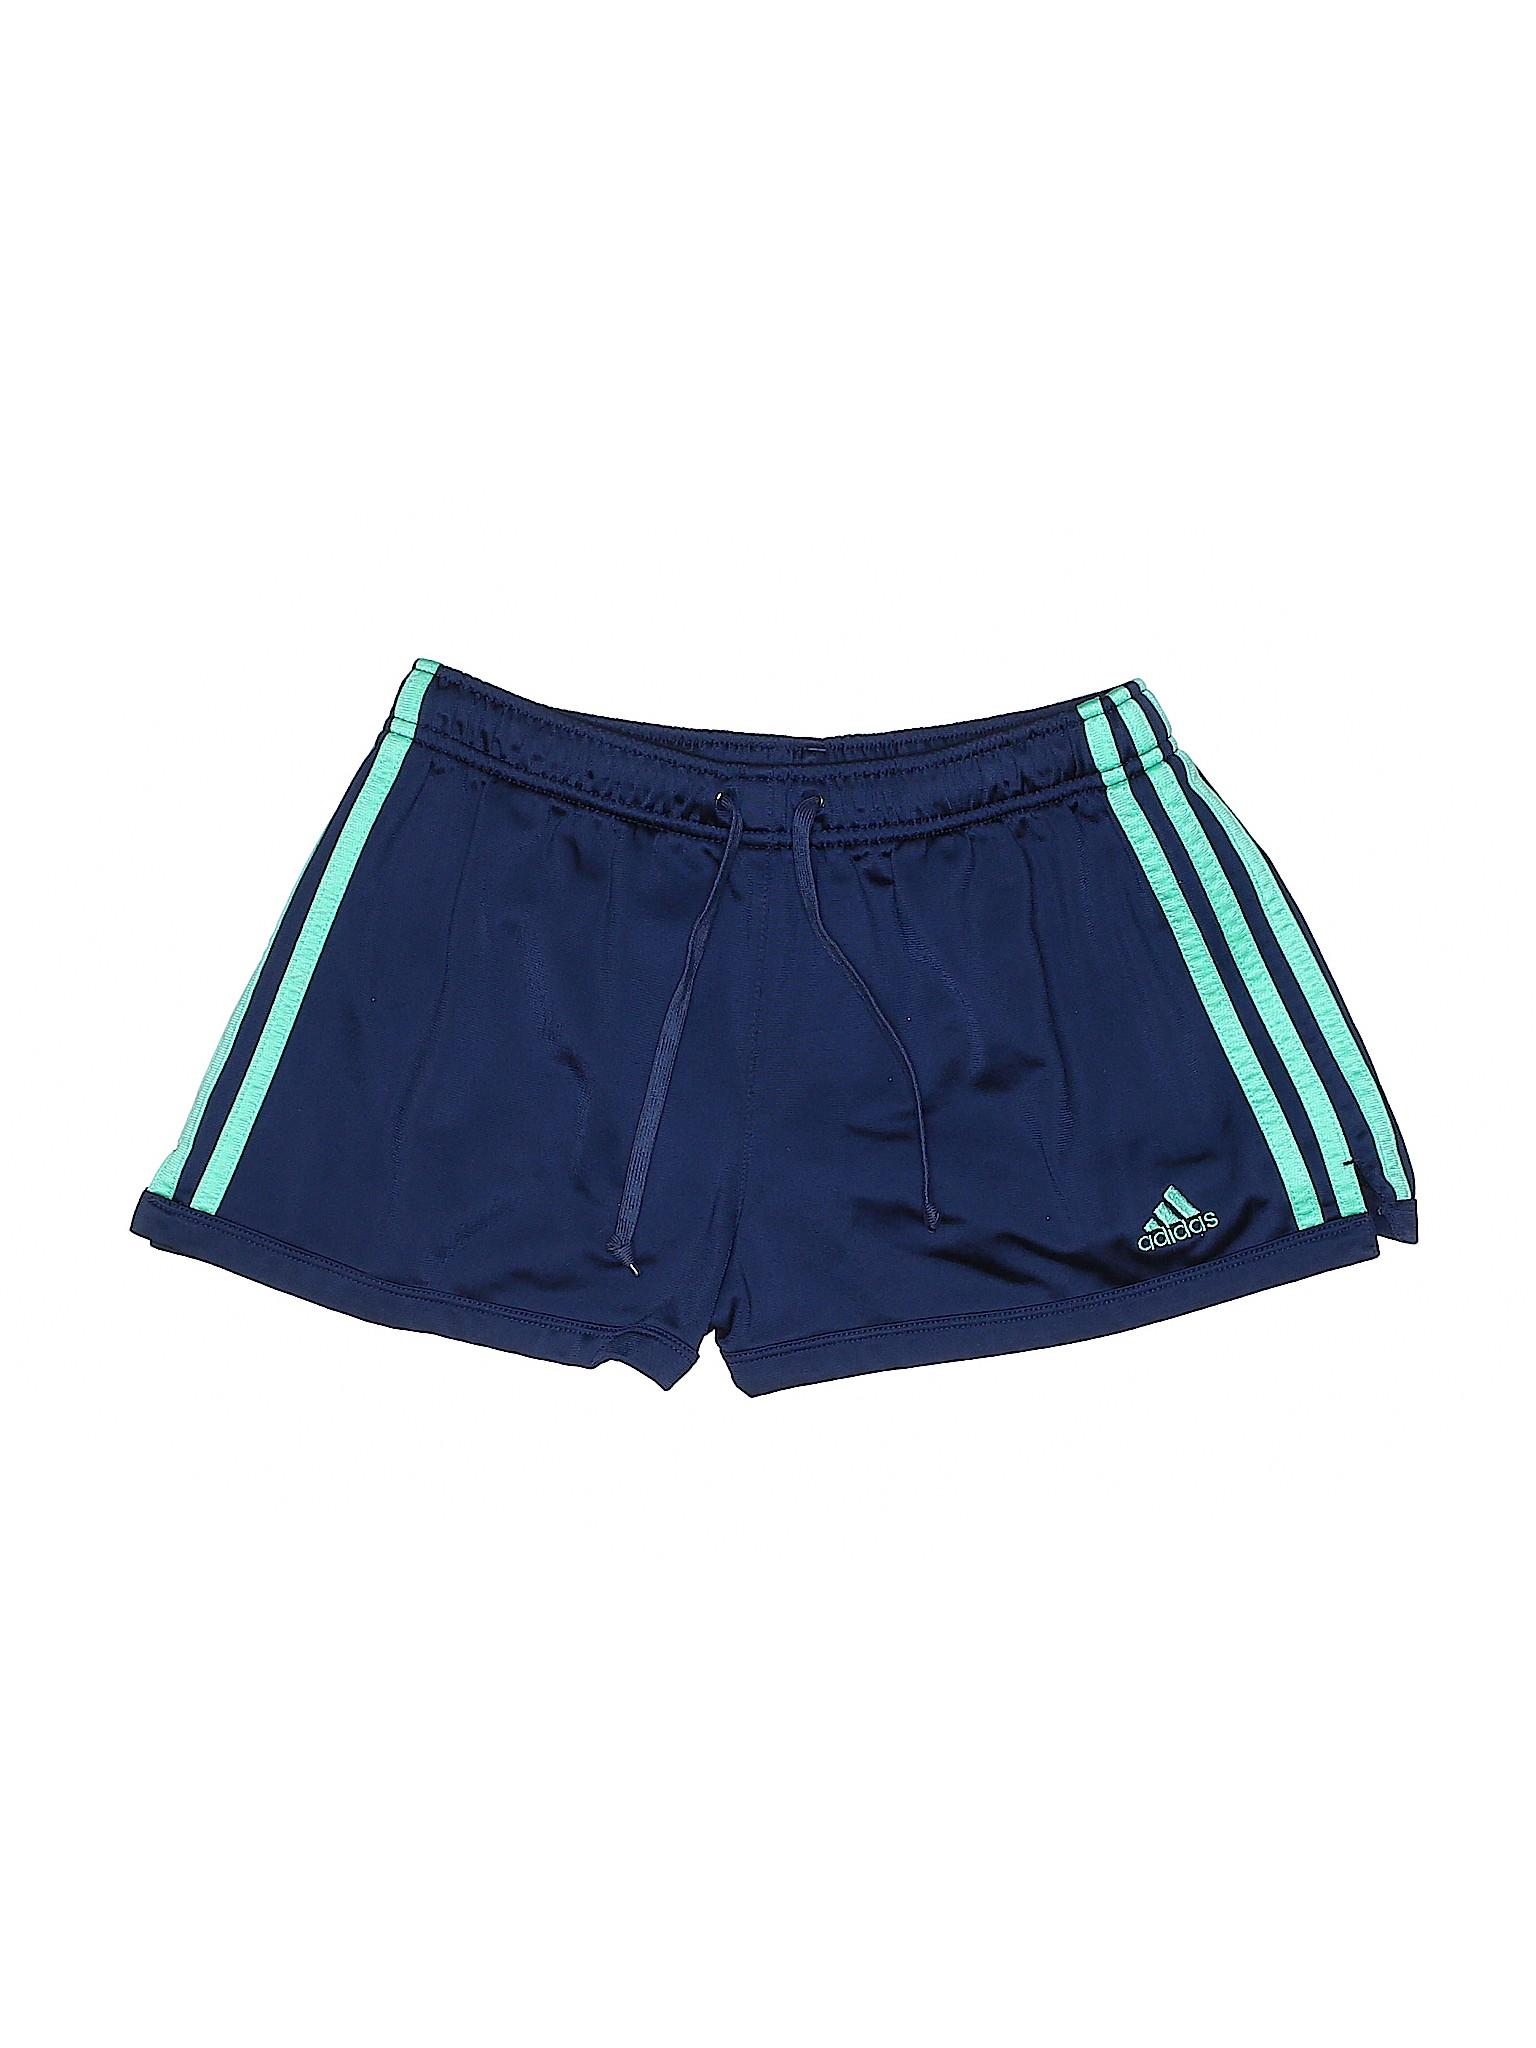 Adidas Boutique Adidas Athletic Shorts Adidas Boutique Shorts Athletic Boutique Athletic taT0Fqw